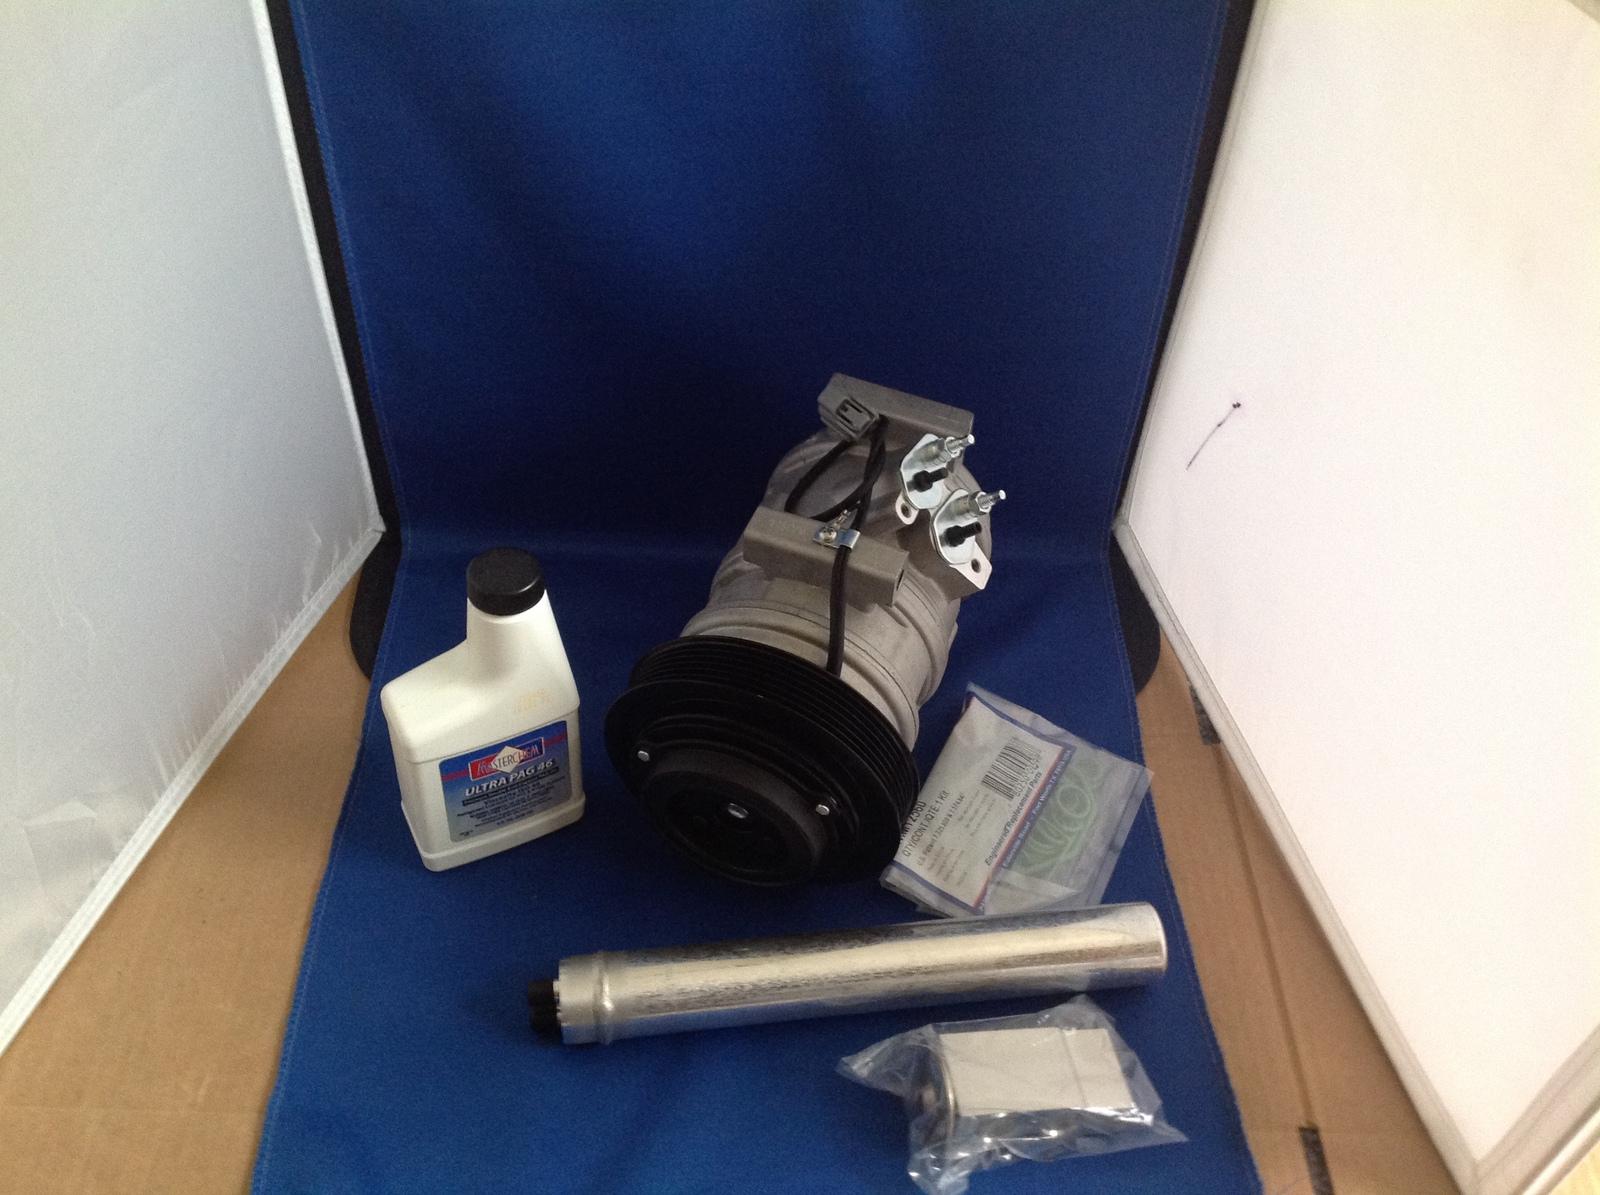 03-07 Honda Accord 3.0 Auto AC Air Conditioning Compressor Part Kit